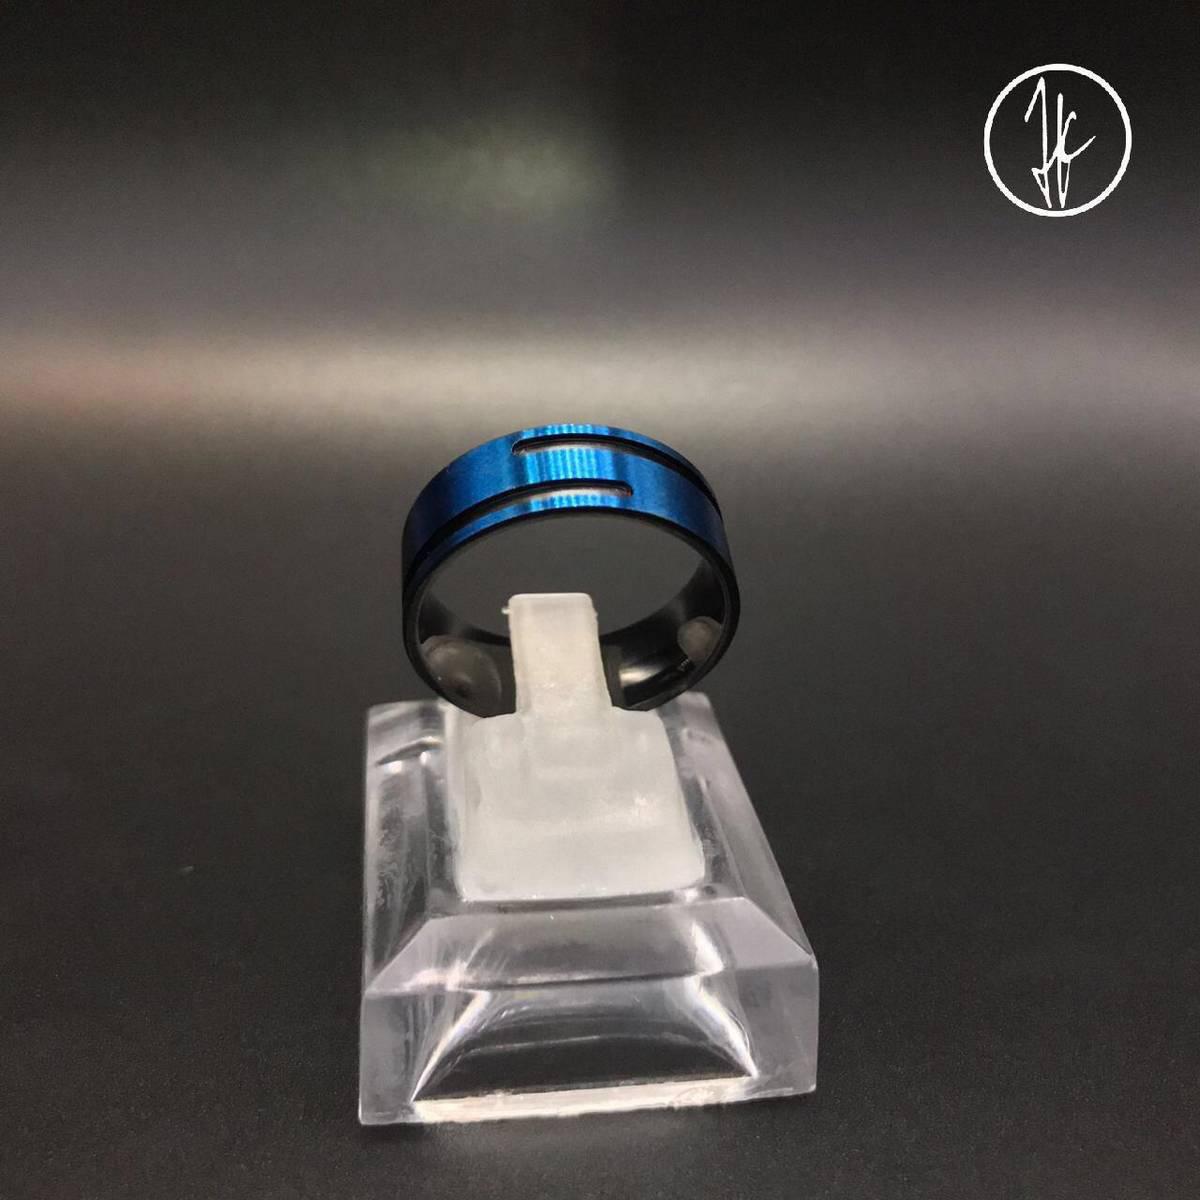 Blue Titanium Trendy Challa Stylish Ring - Unisex